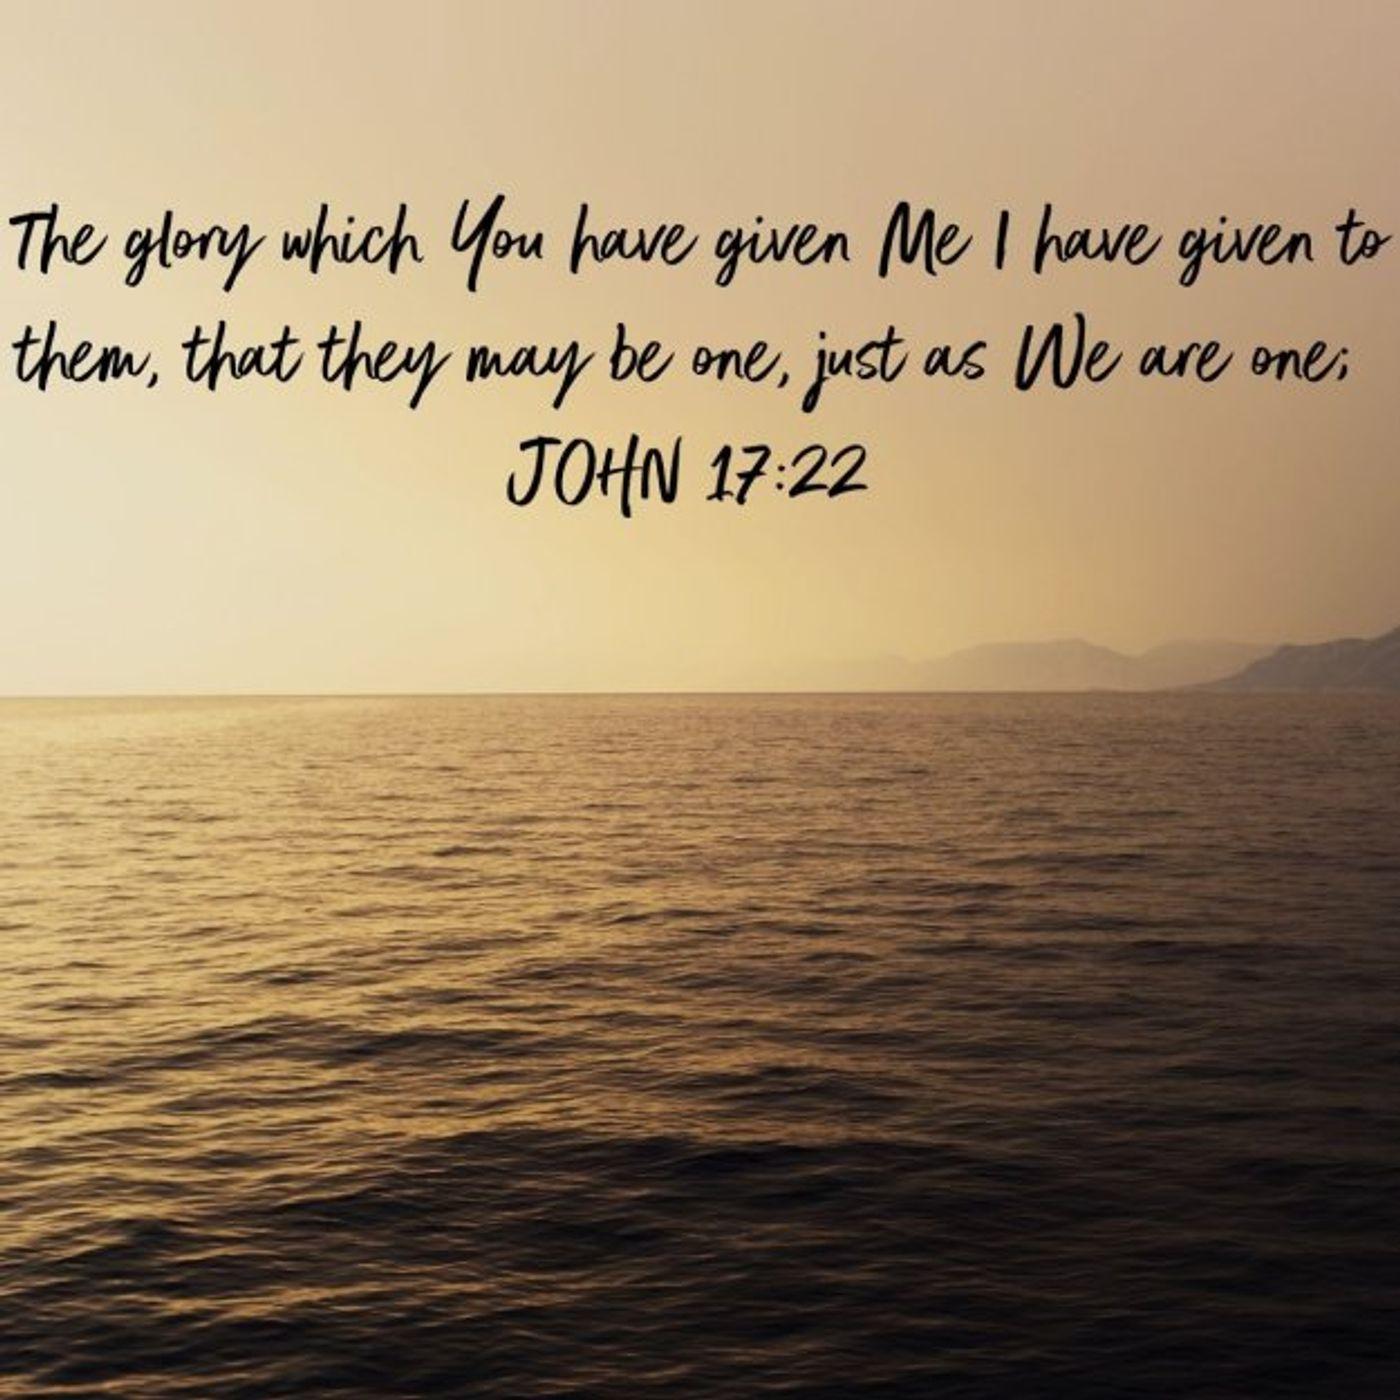 John 17:22: What Glory is Jesus Referring To?